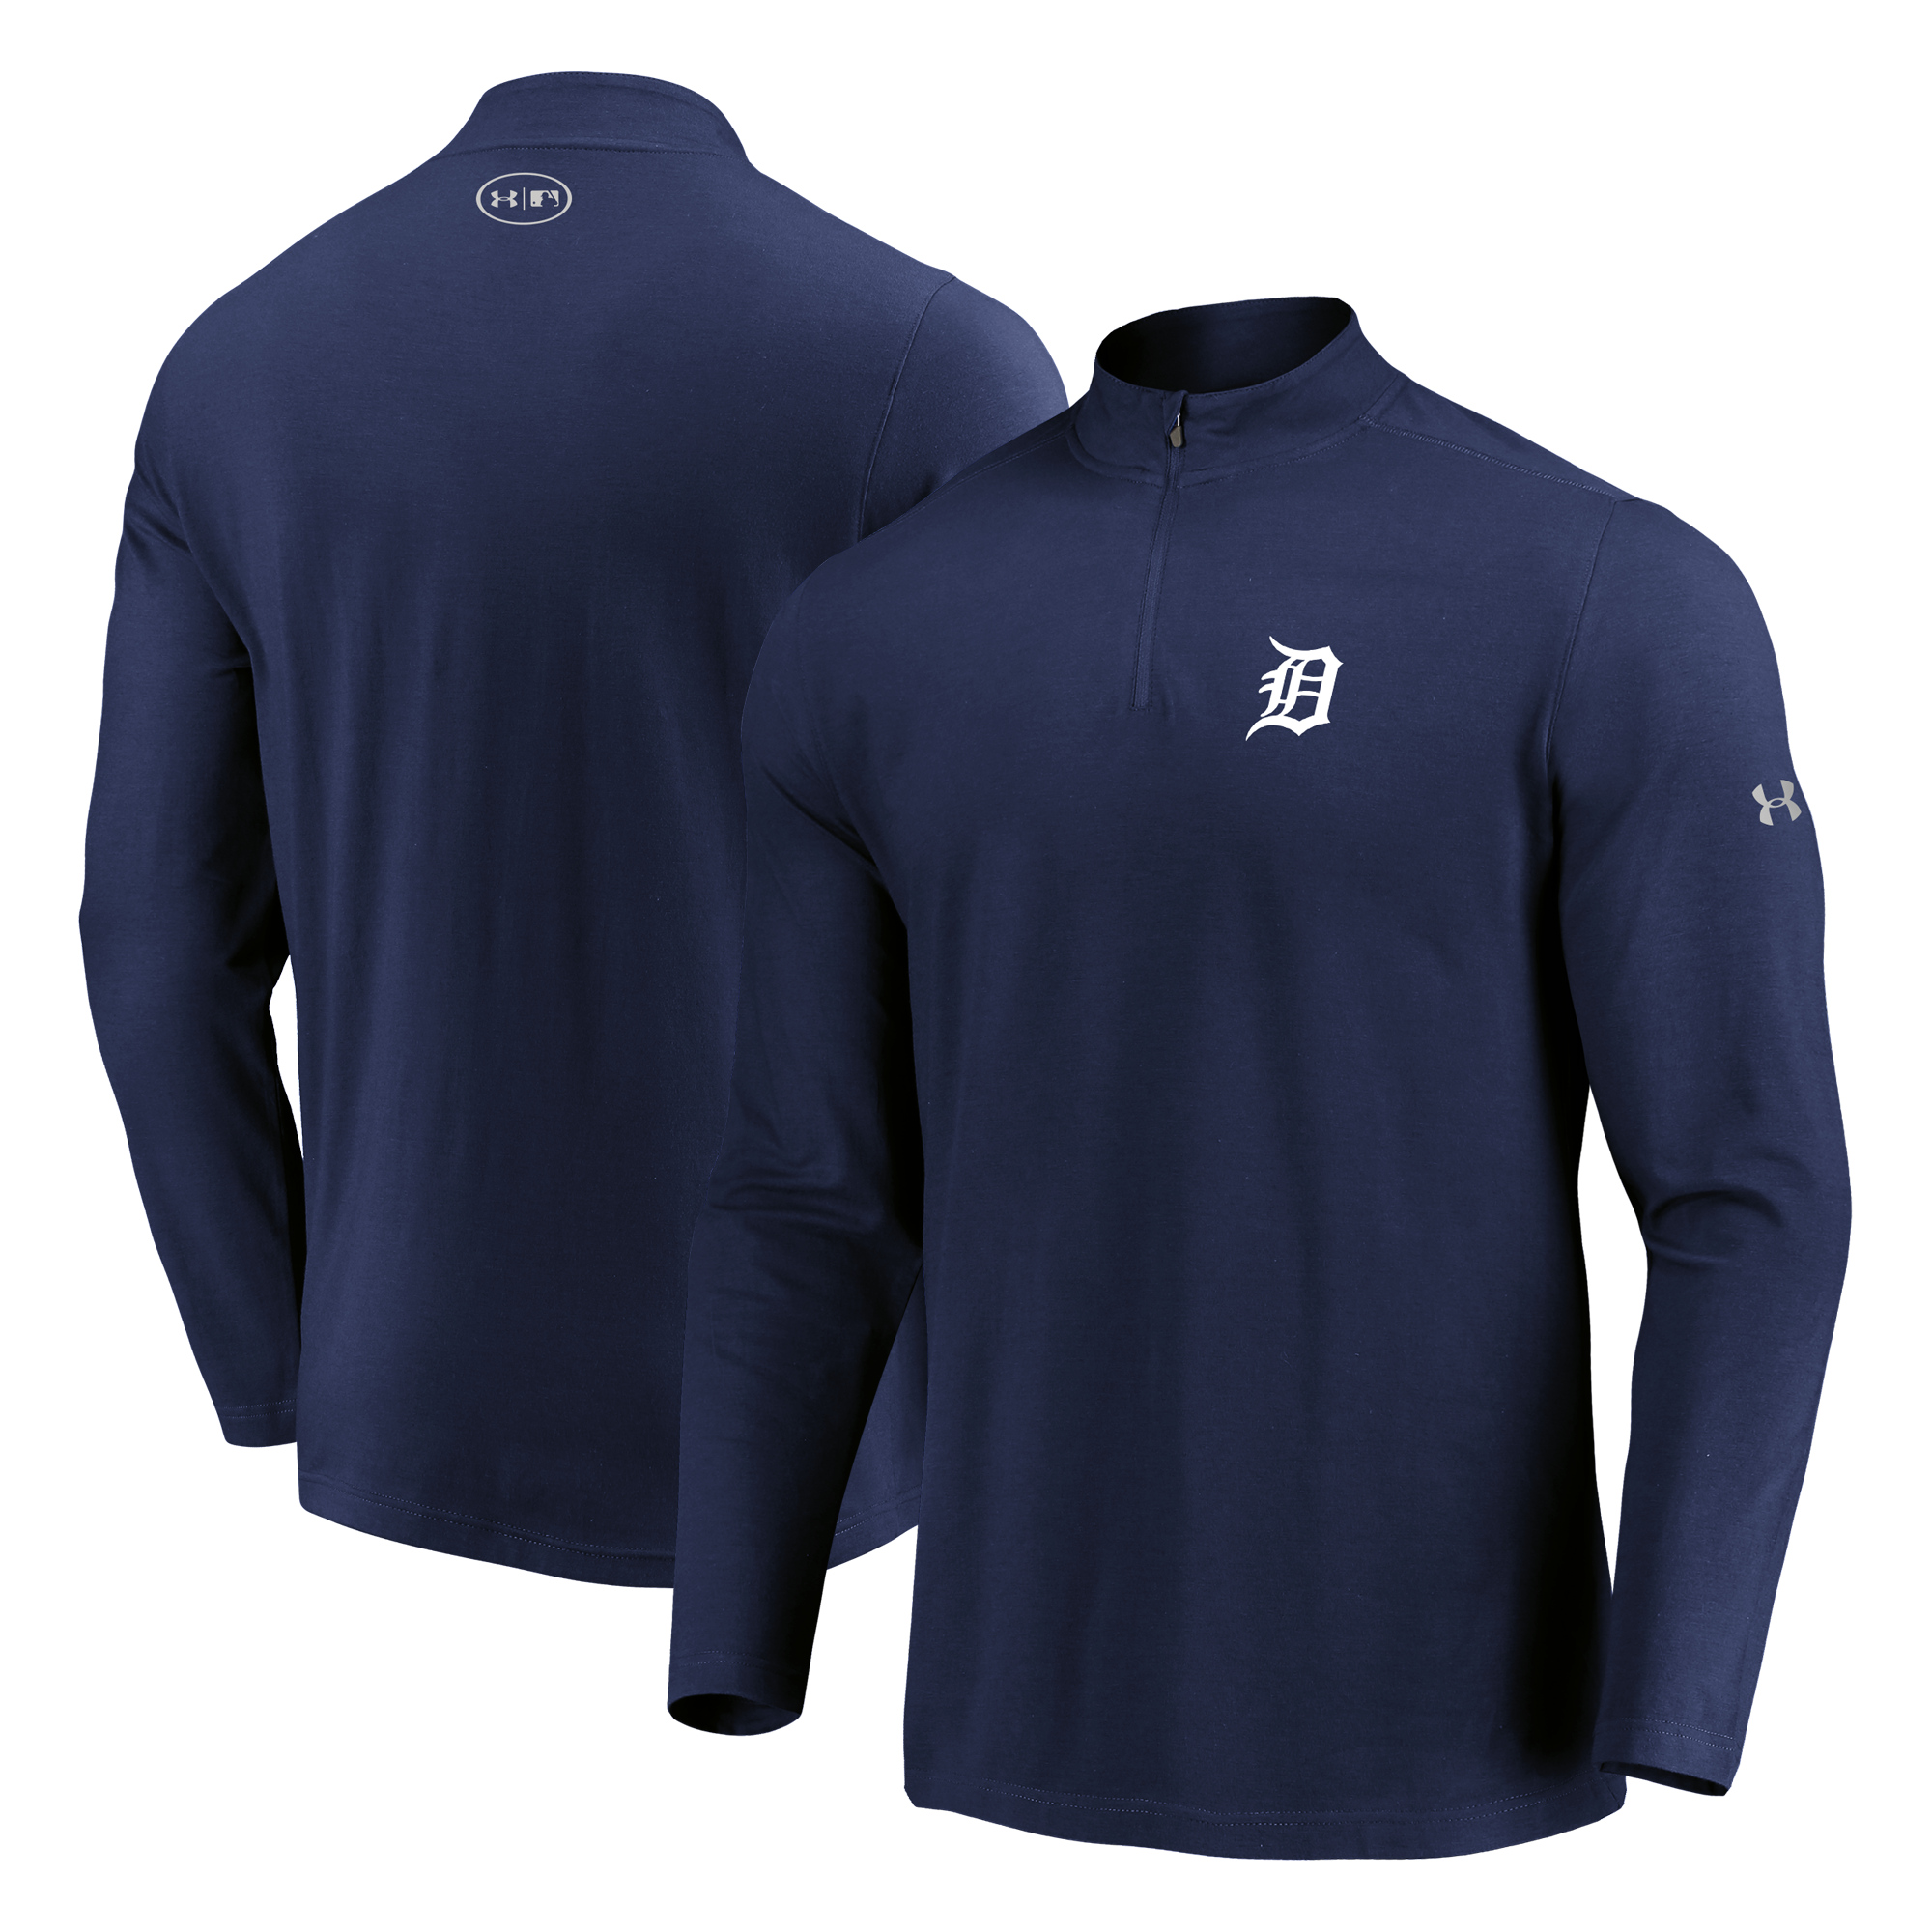 Detroit Tigers Under Armour Passion Performance Tri-Blend Quarter-Zip Pullover Jacket - Navy